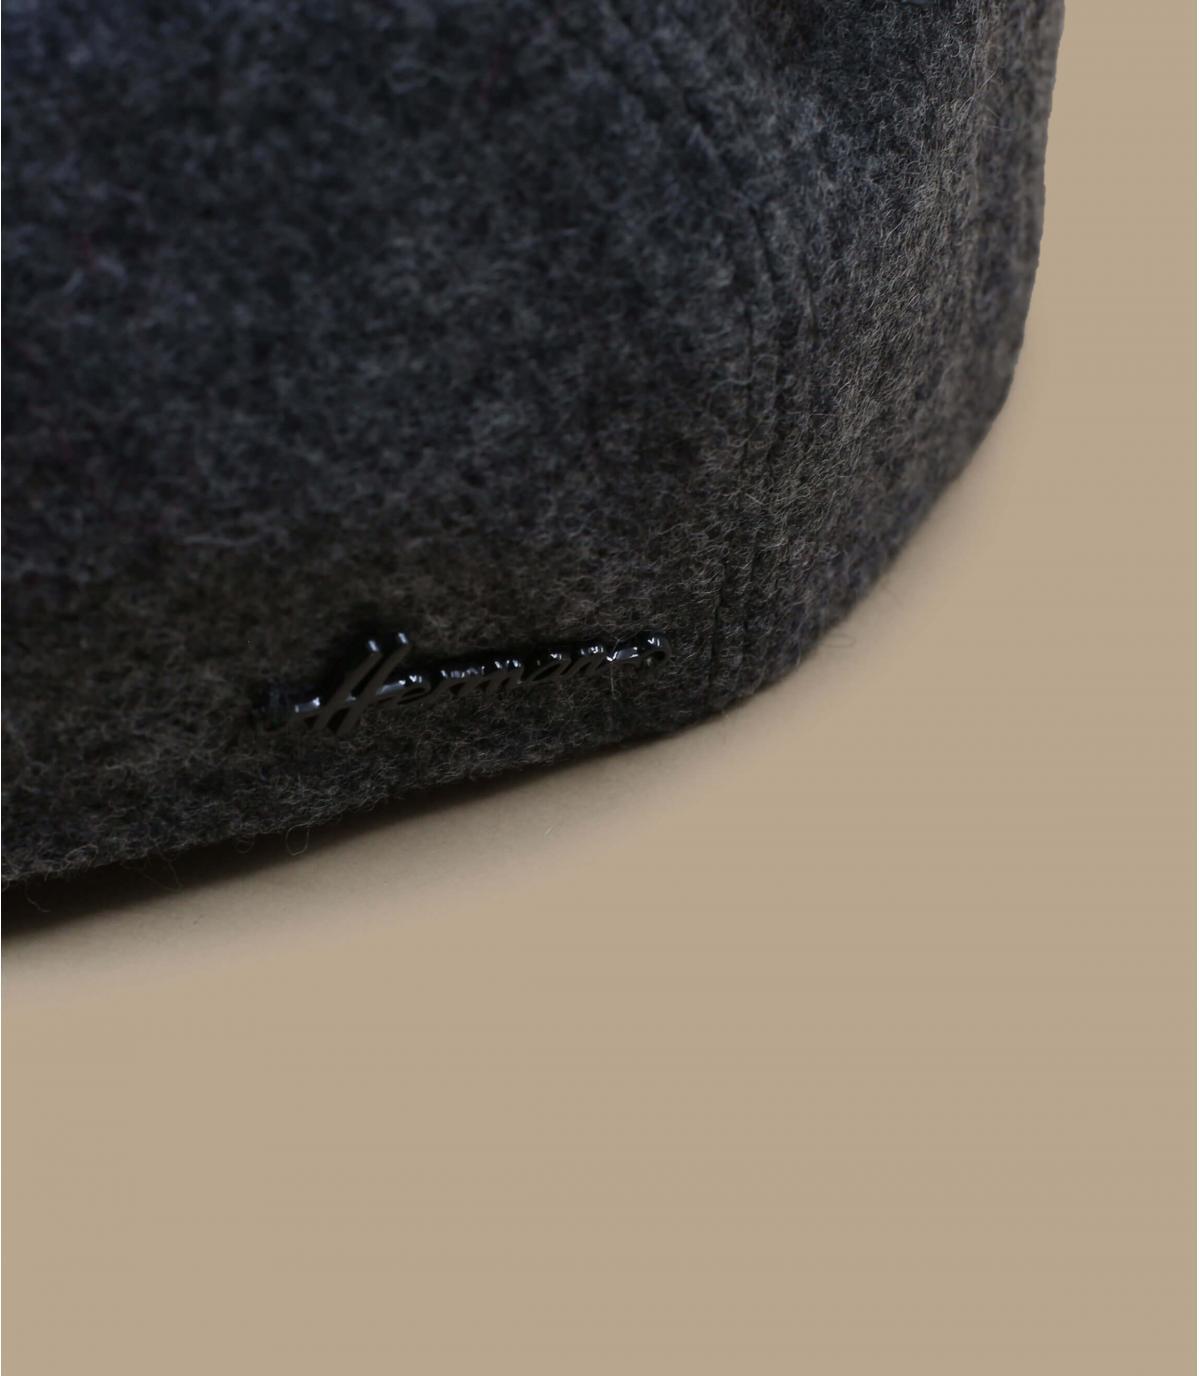 Barett grau Wolle Ohrenschützer